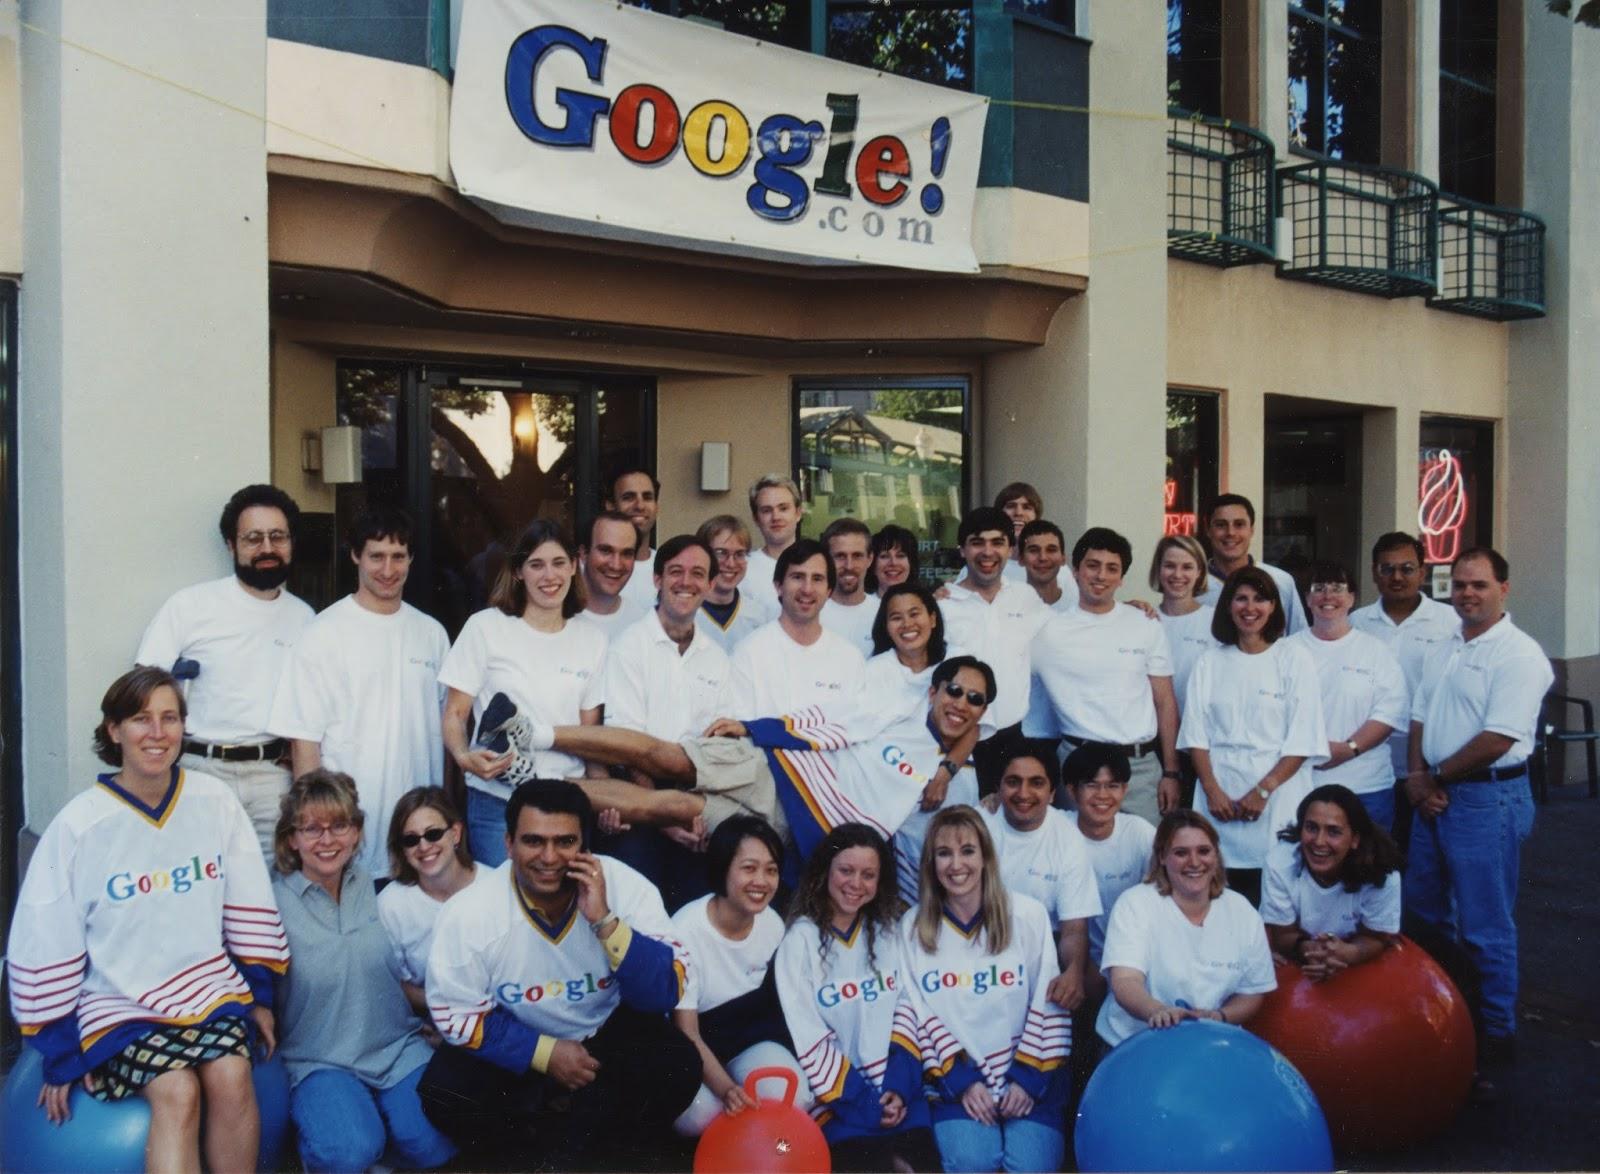 google-1999